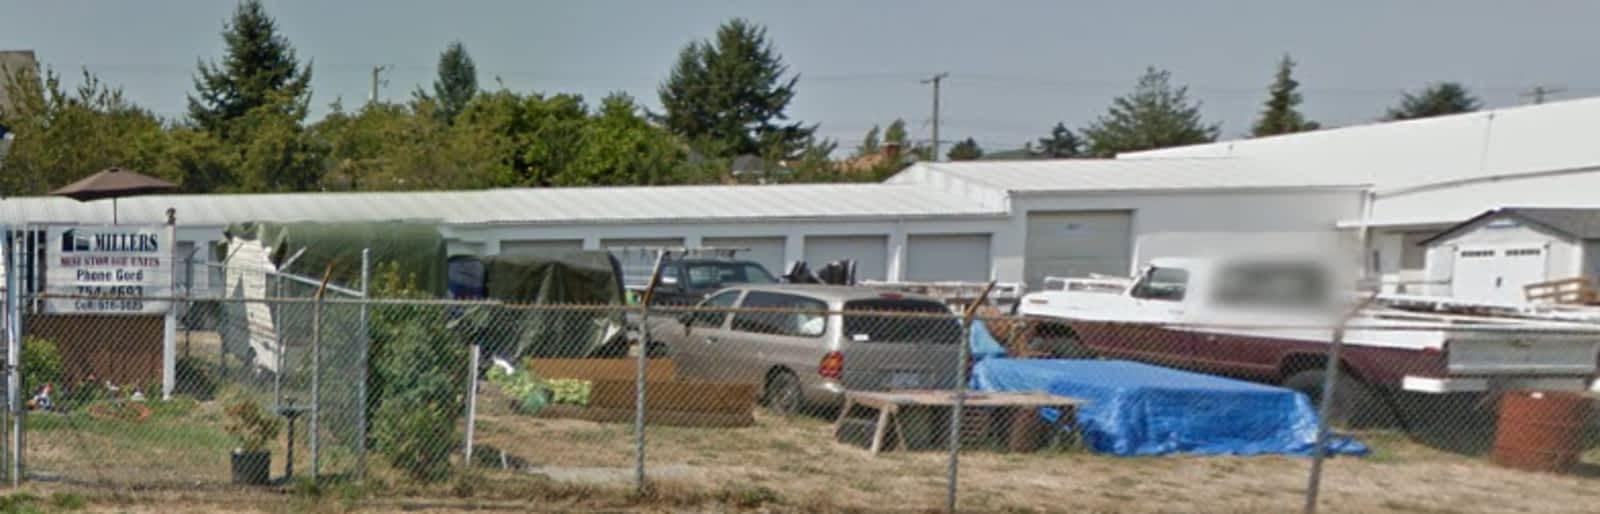 & Milleru0027s Mini Storage Units - Opening Hours - 150 Fry St Nanaimo BC